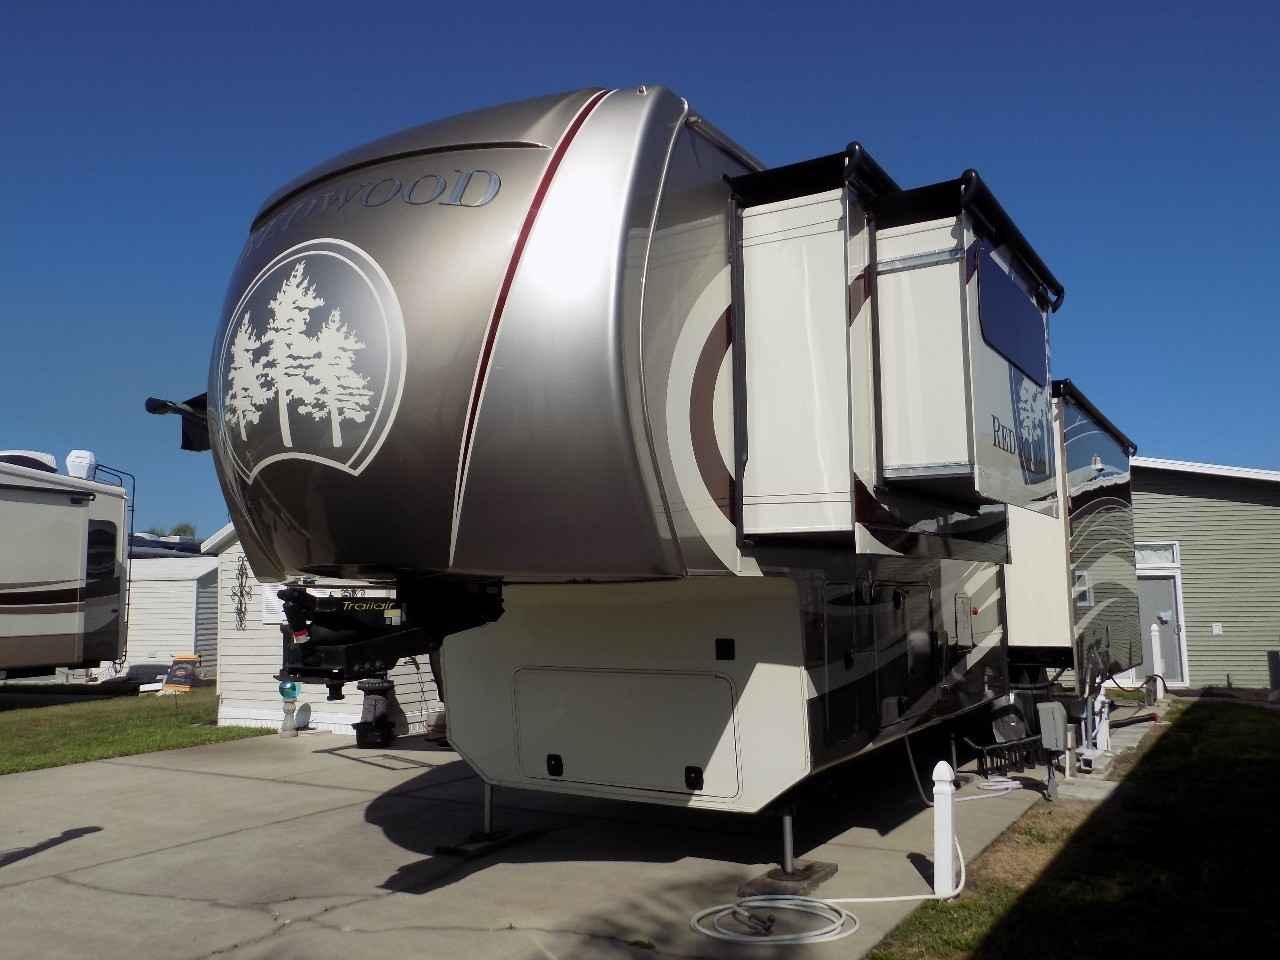 2015 Used Crossroads Redwood 38gk Fifth Wheel In Florida Fl